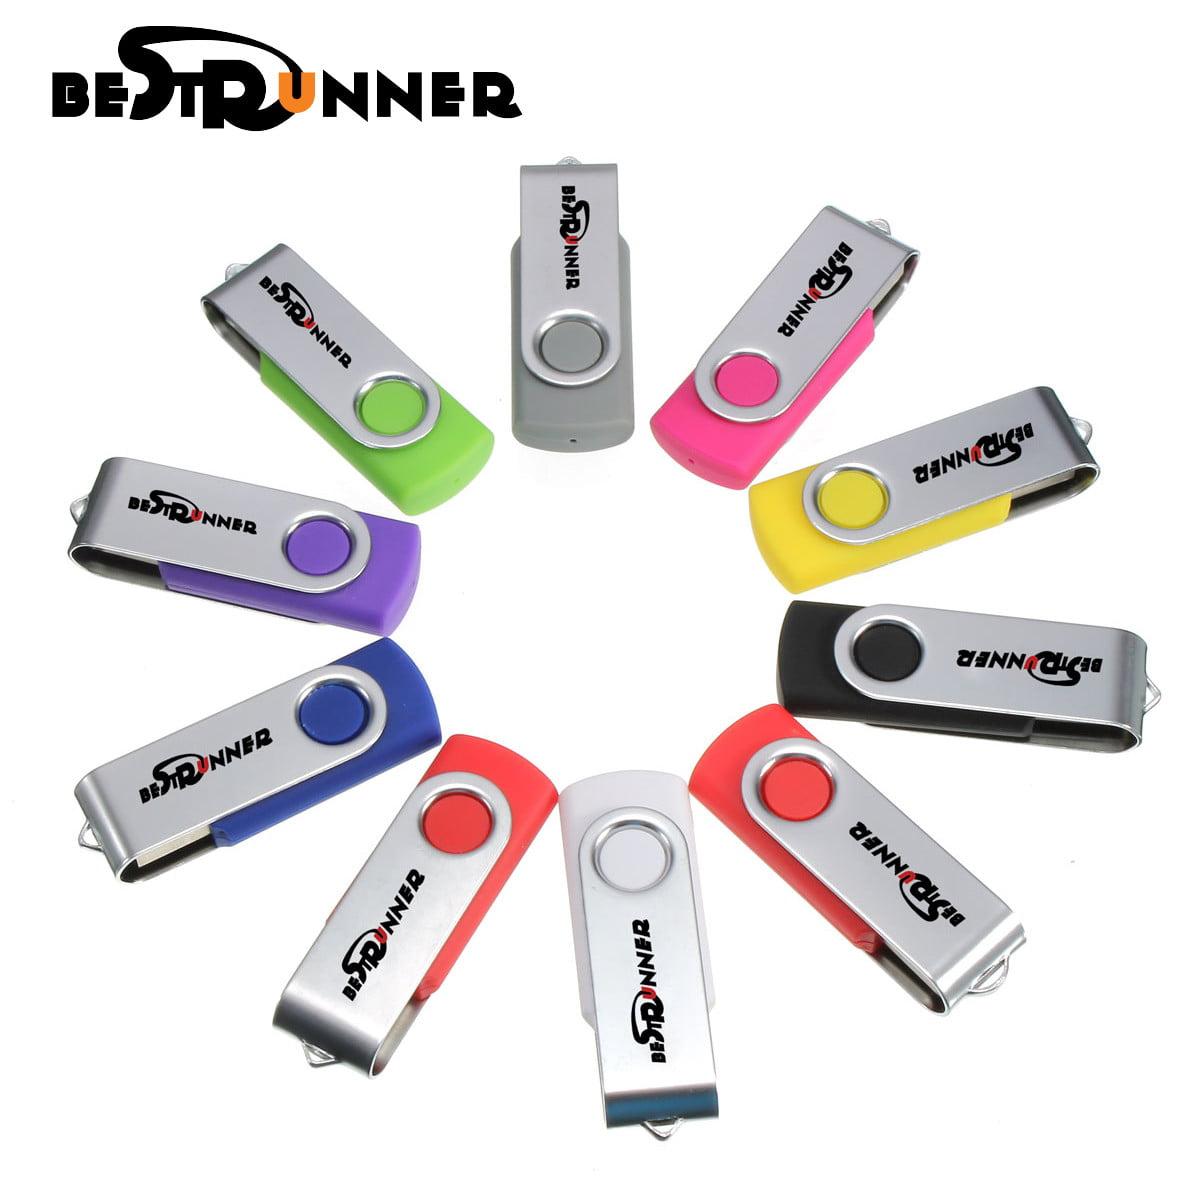 8GB 8G 8 GB G USB 2.0 Memory Stick Flash Drive Speicher Speichstick Memorystick